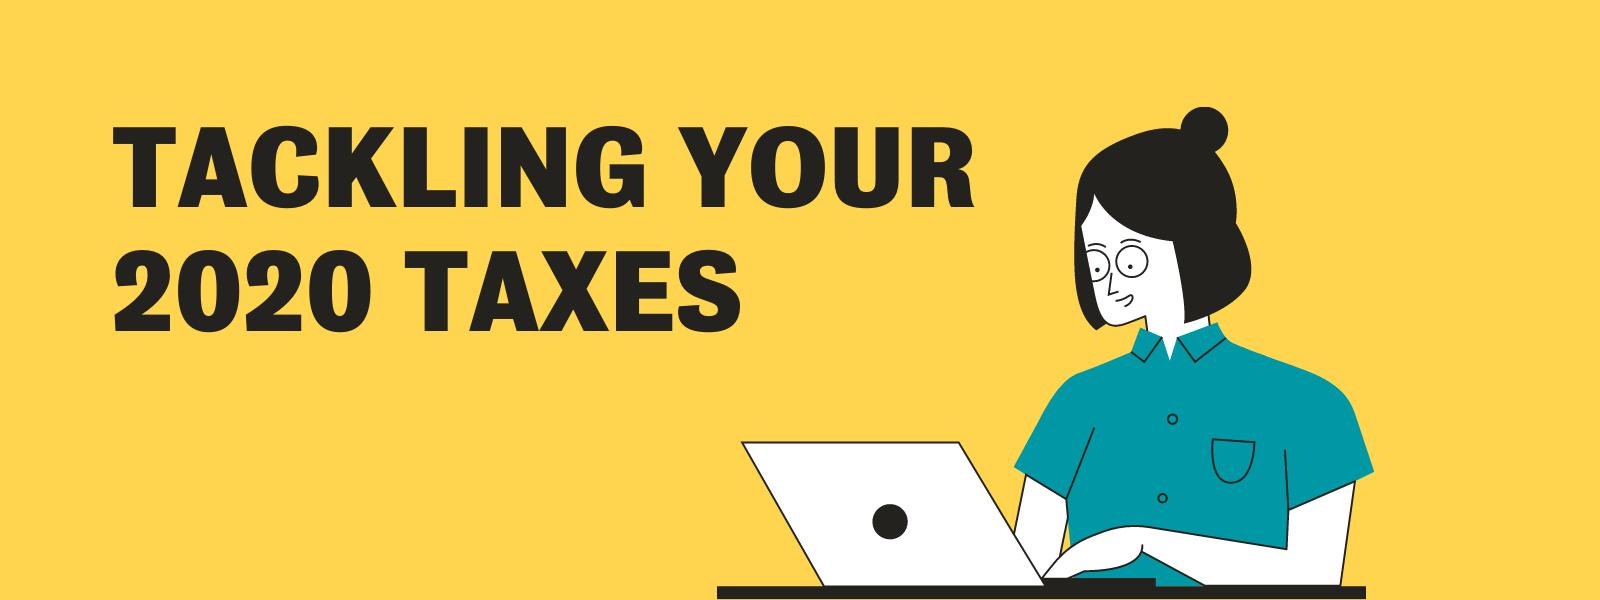 Tackling your taxes